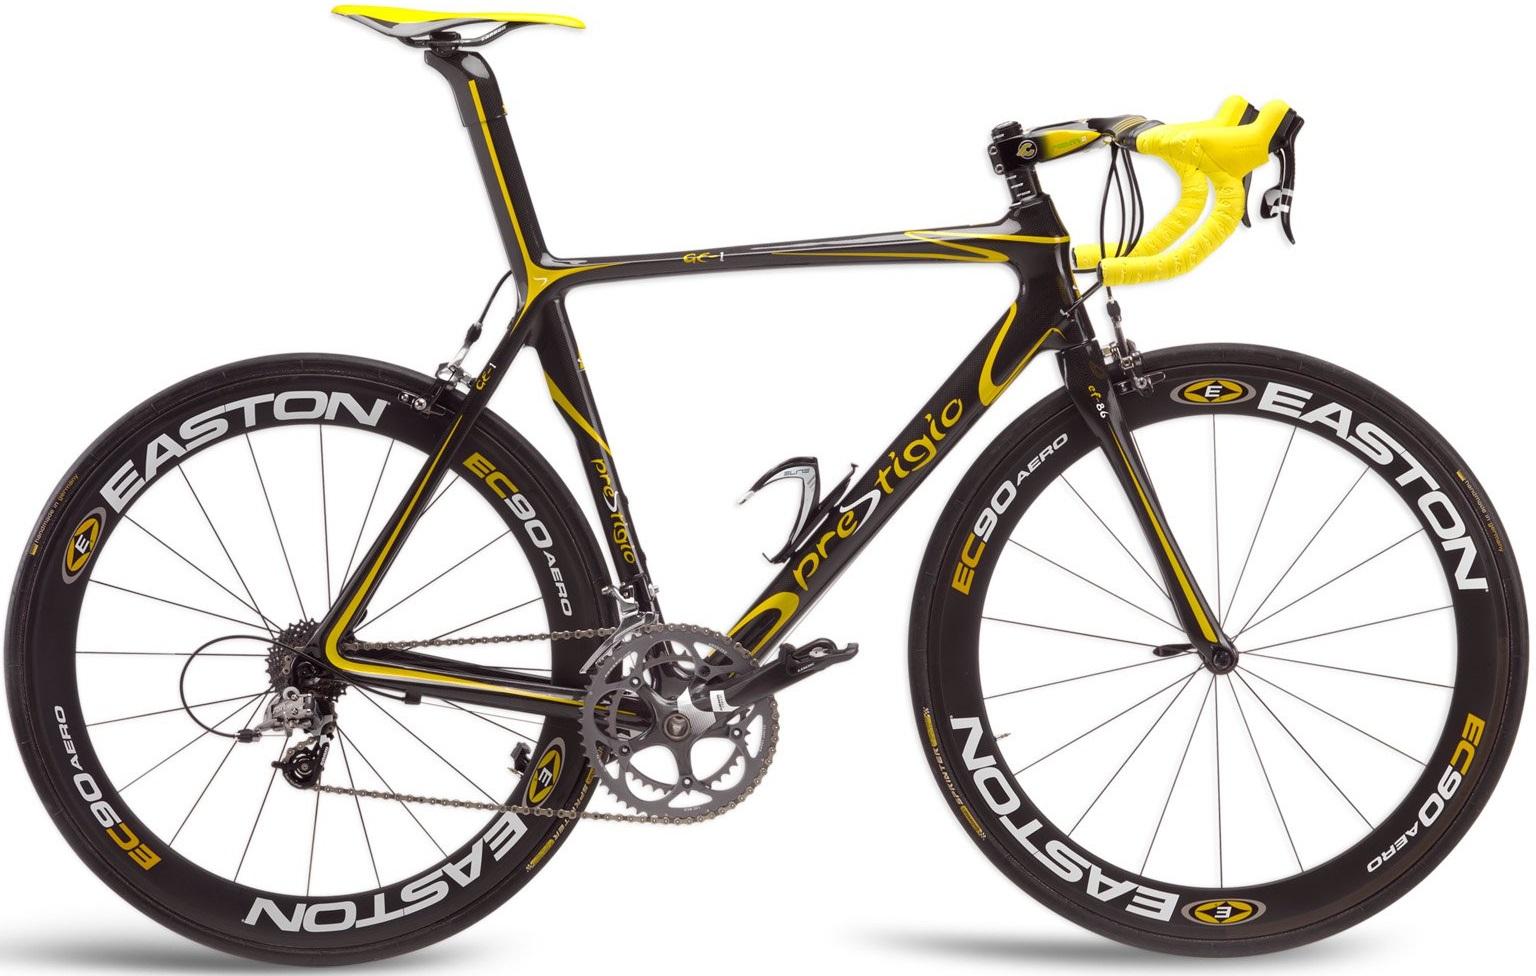 2015 Prestigio GE-1 black yellow sramneuroticarnutz2015 Prestigio GE-1 black yellow sram2016 Pinarello Dogma F8 yellow dura ace